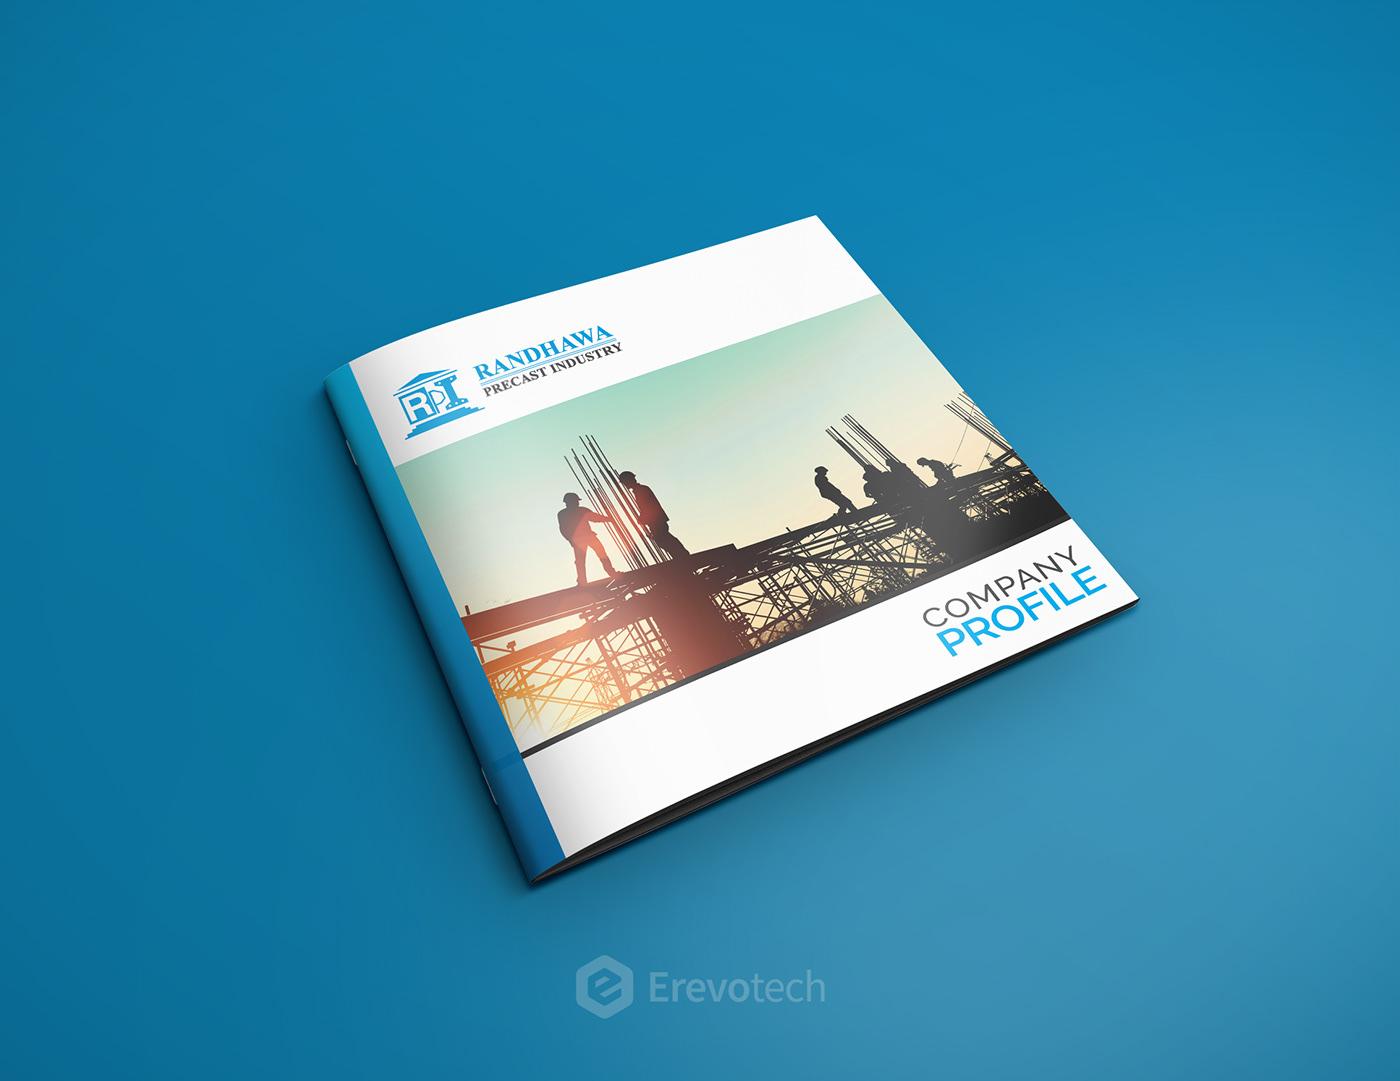 randhawa precasting industries profile